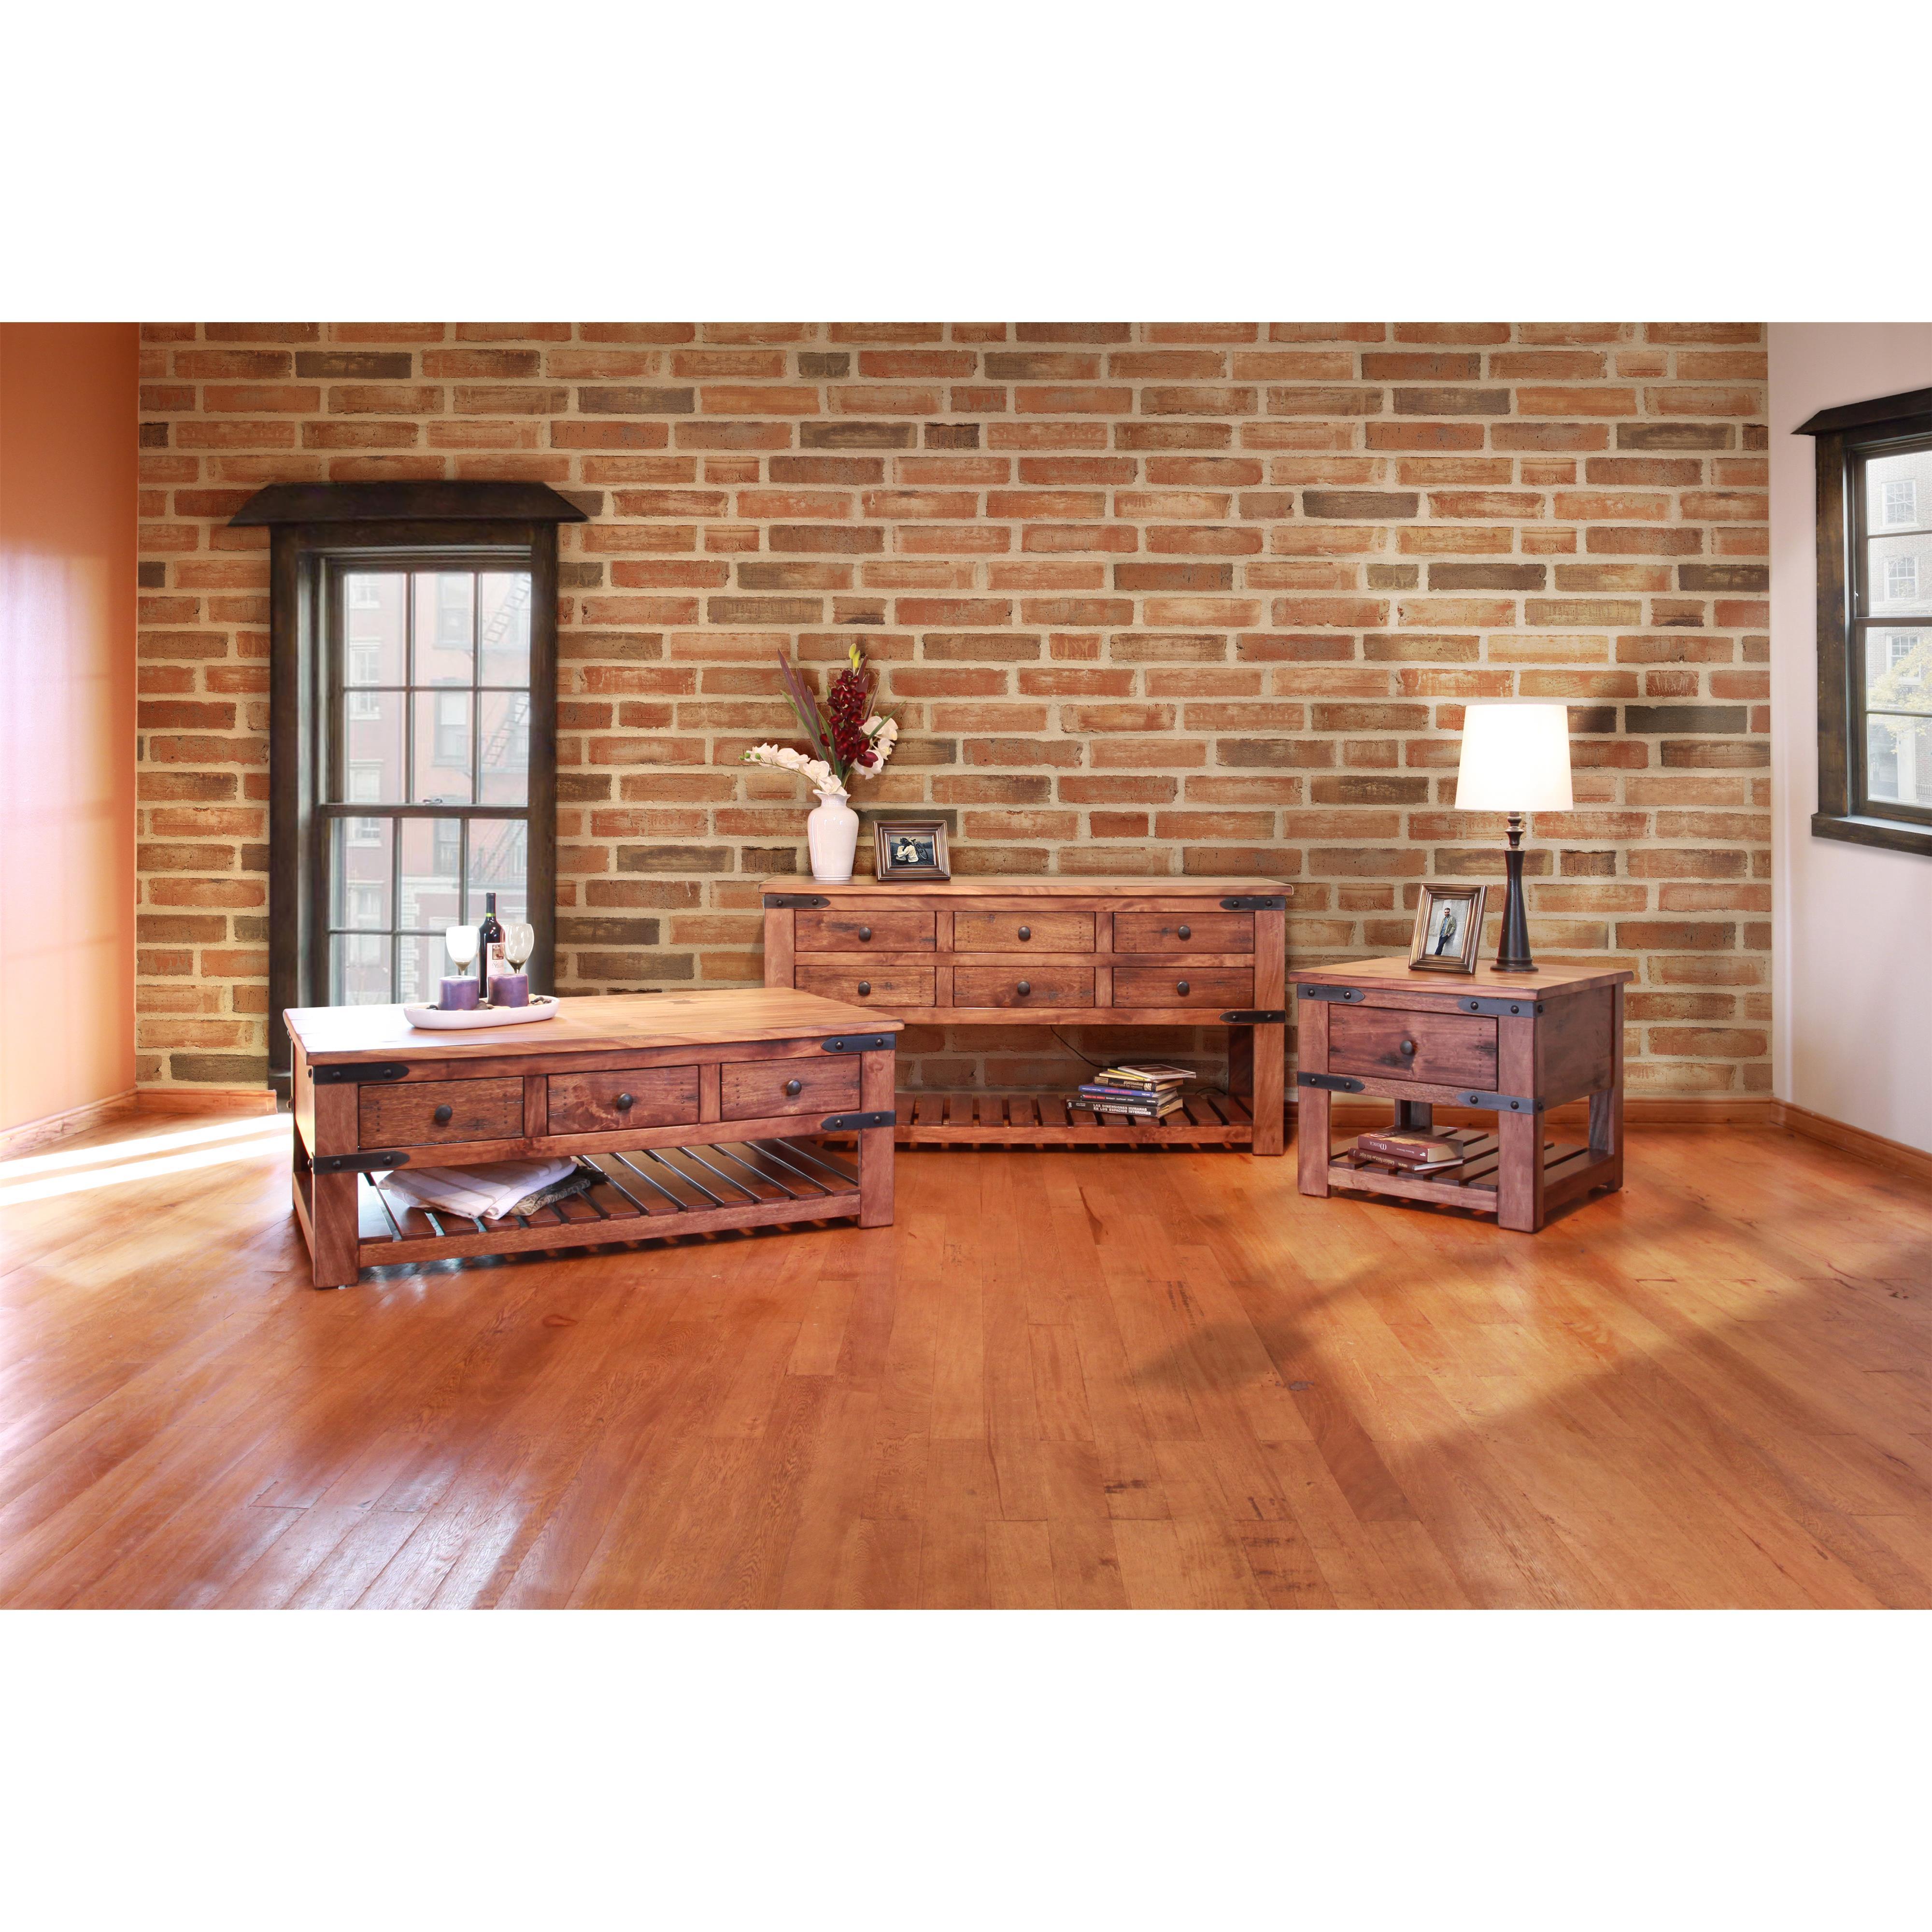 International Furniture Direct Parota Ifd866sofa Sofa Table With 6 Drawers Dunk Bright